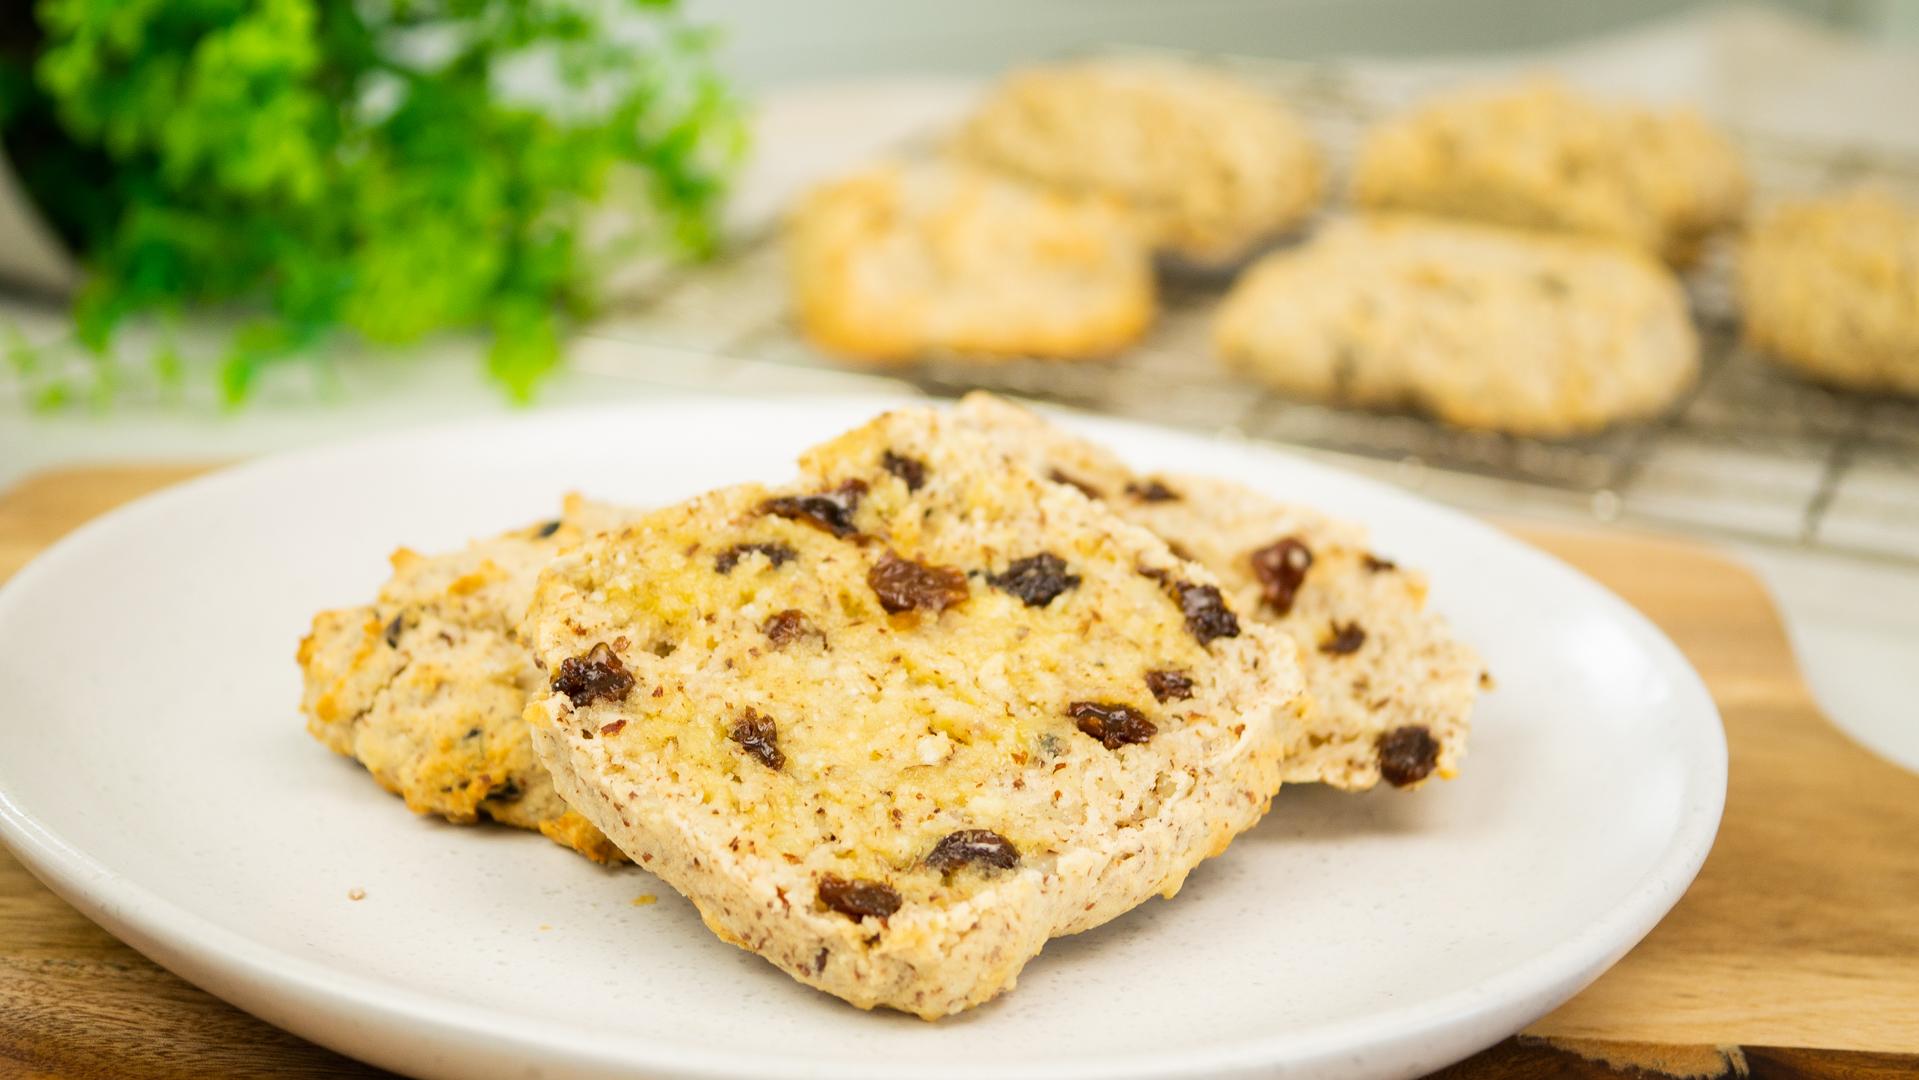 Homemade gluten free scones